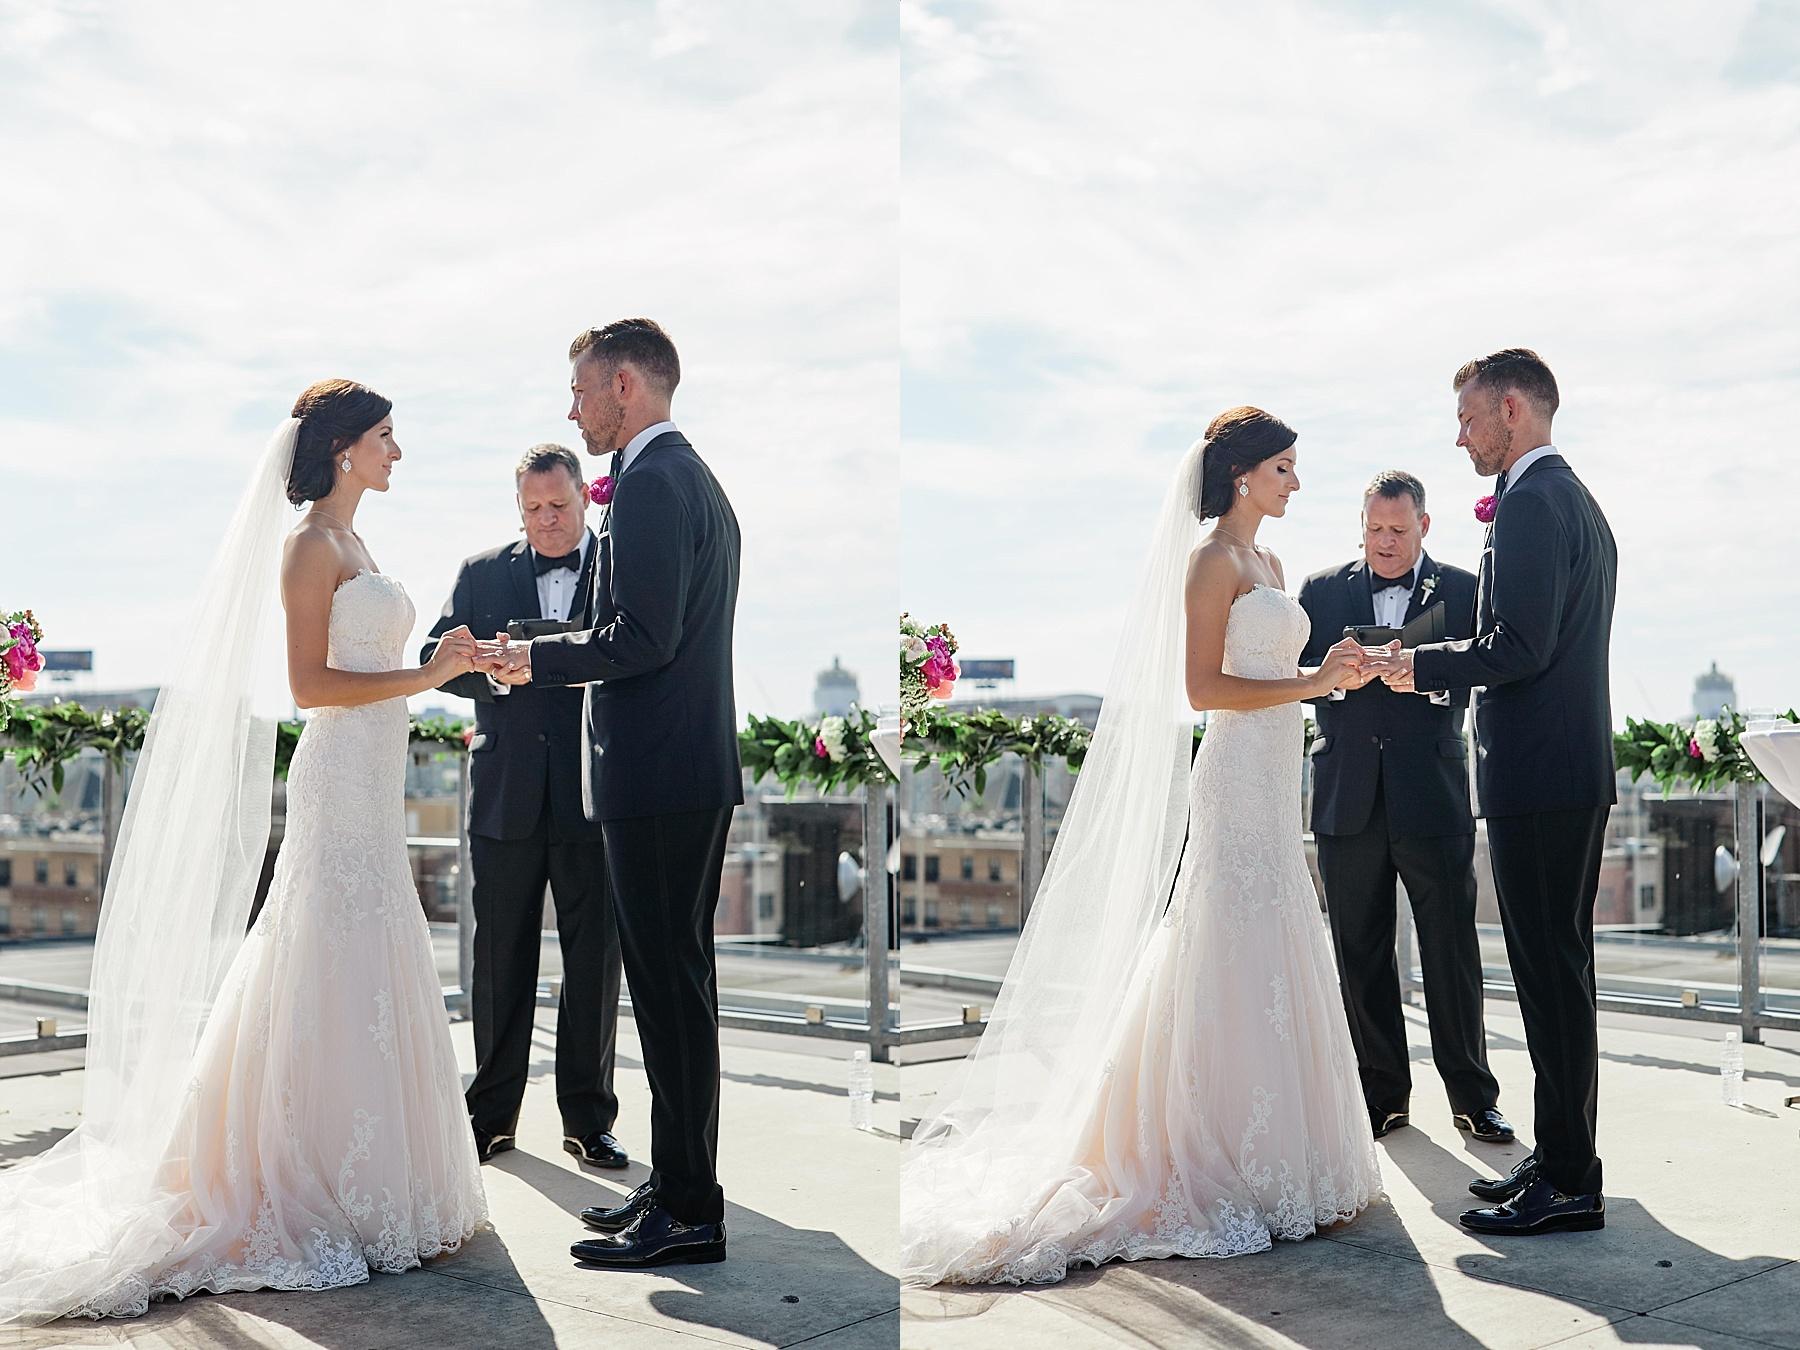 ABULAE-Wedding-Saint-paul-MN-Josh-Sofia-Wedding-Mears-Park_0767.jpg